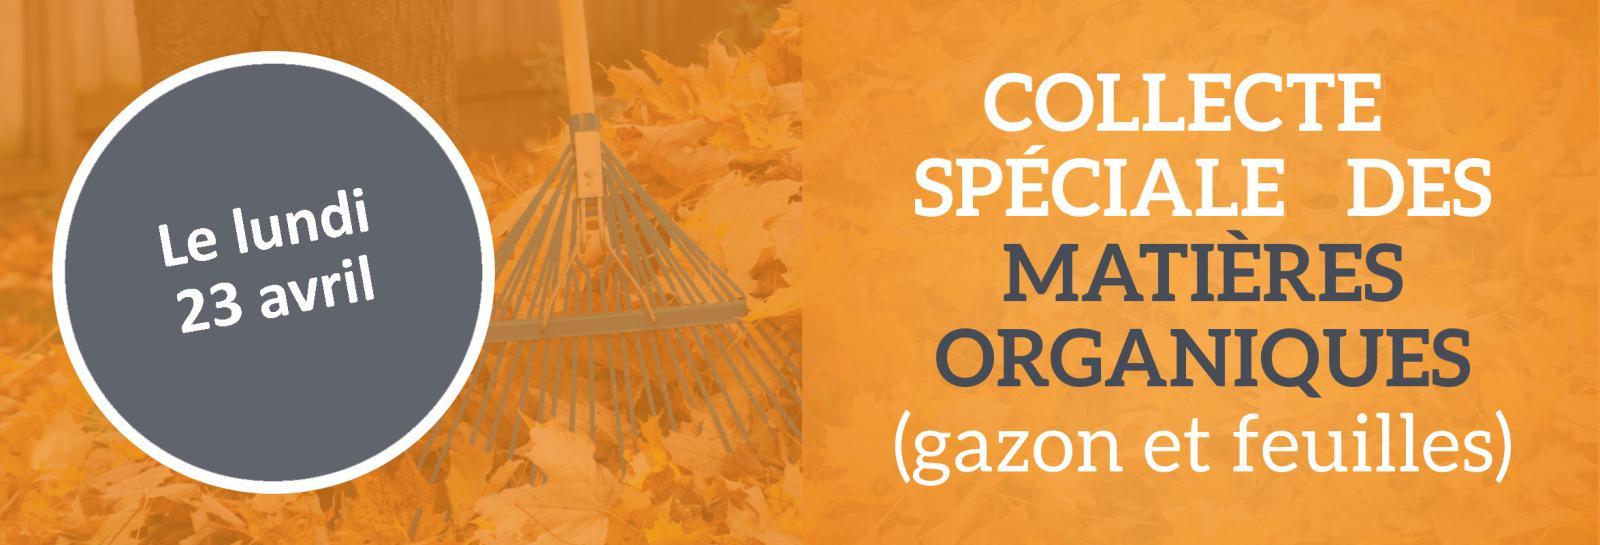 collecte speciale matiere organique